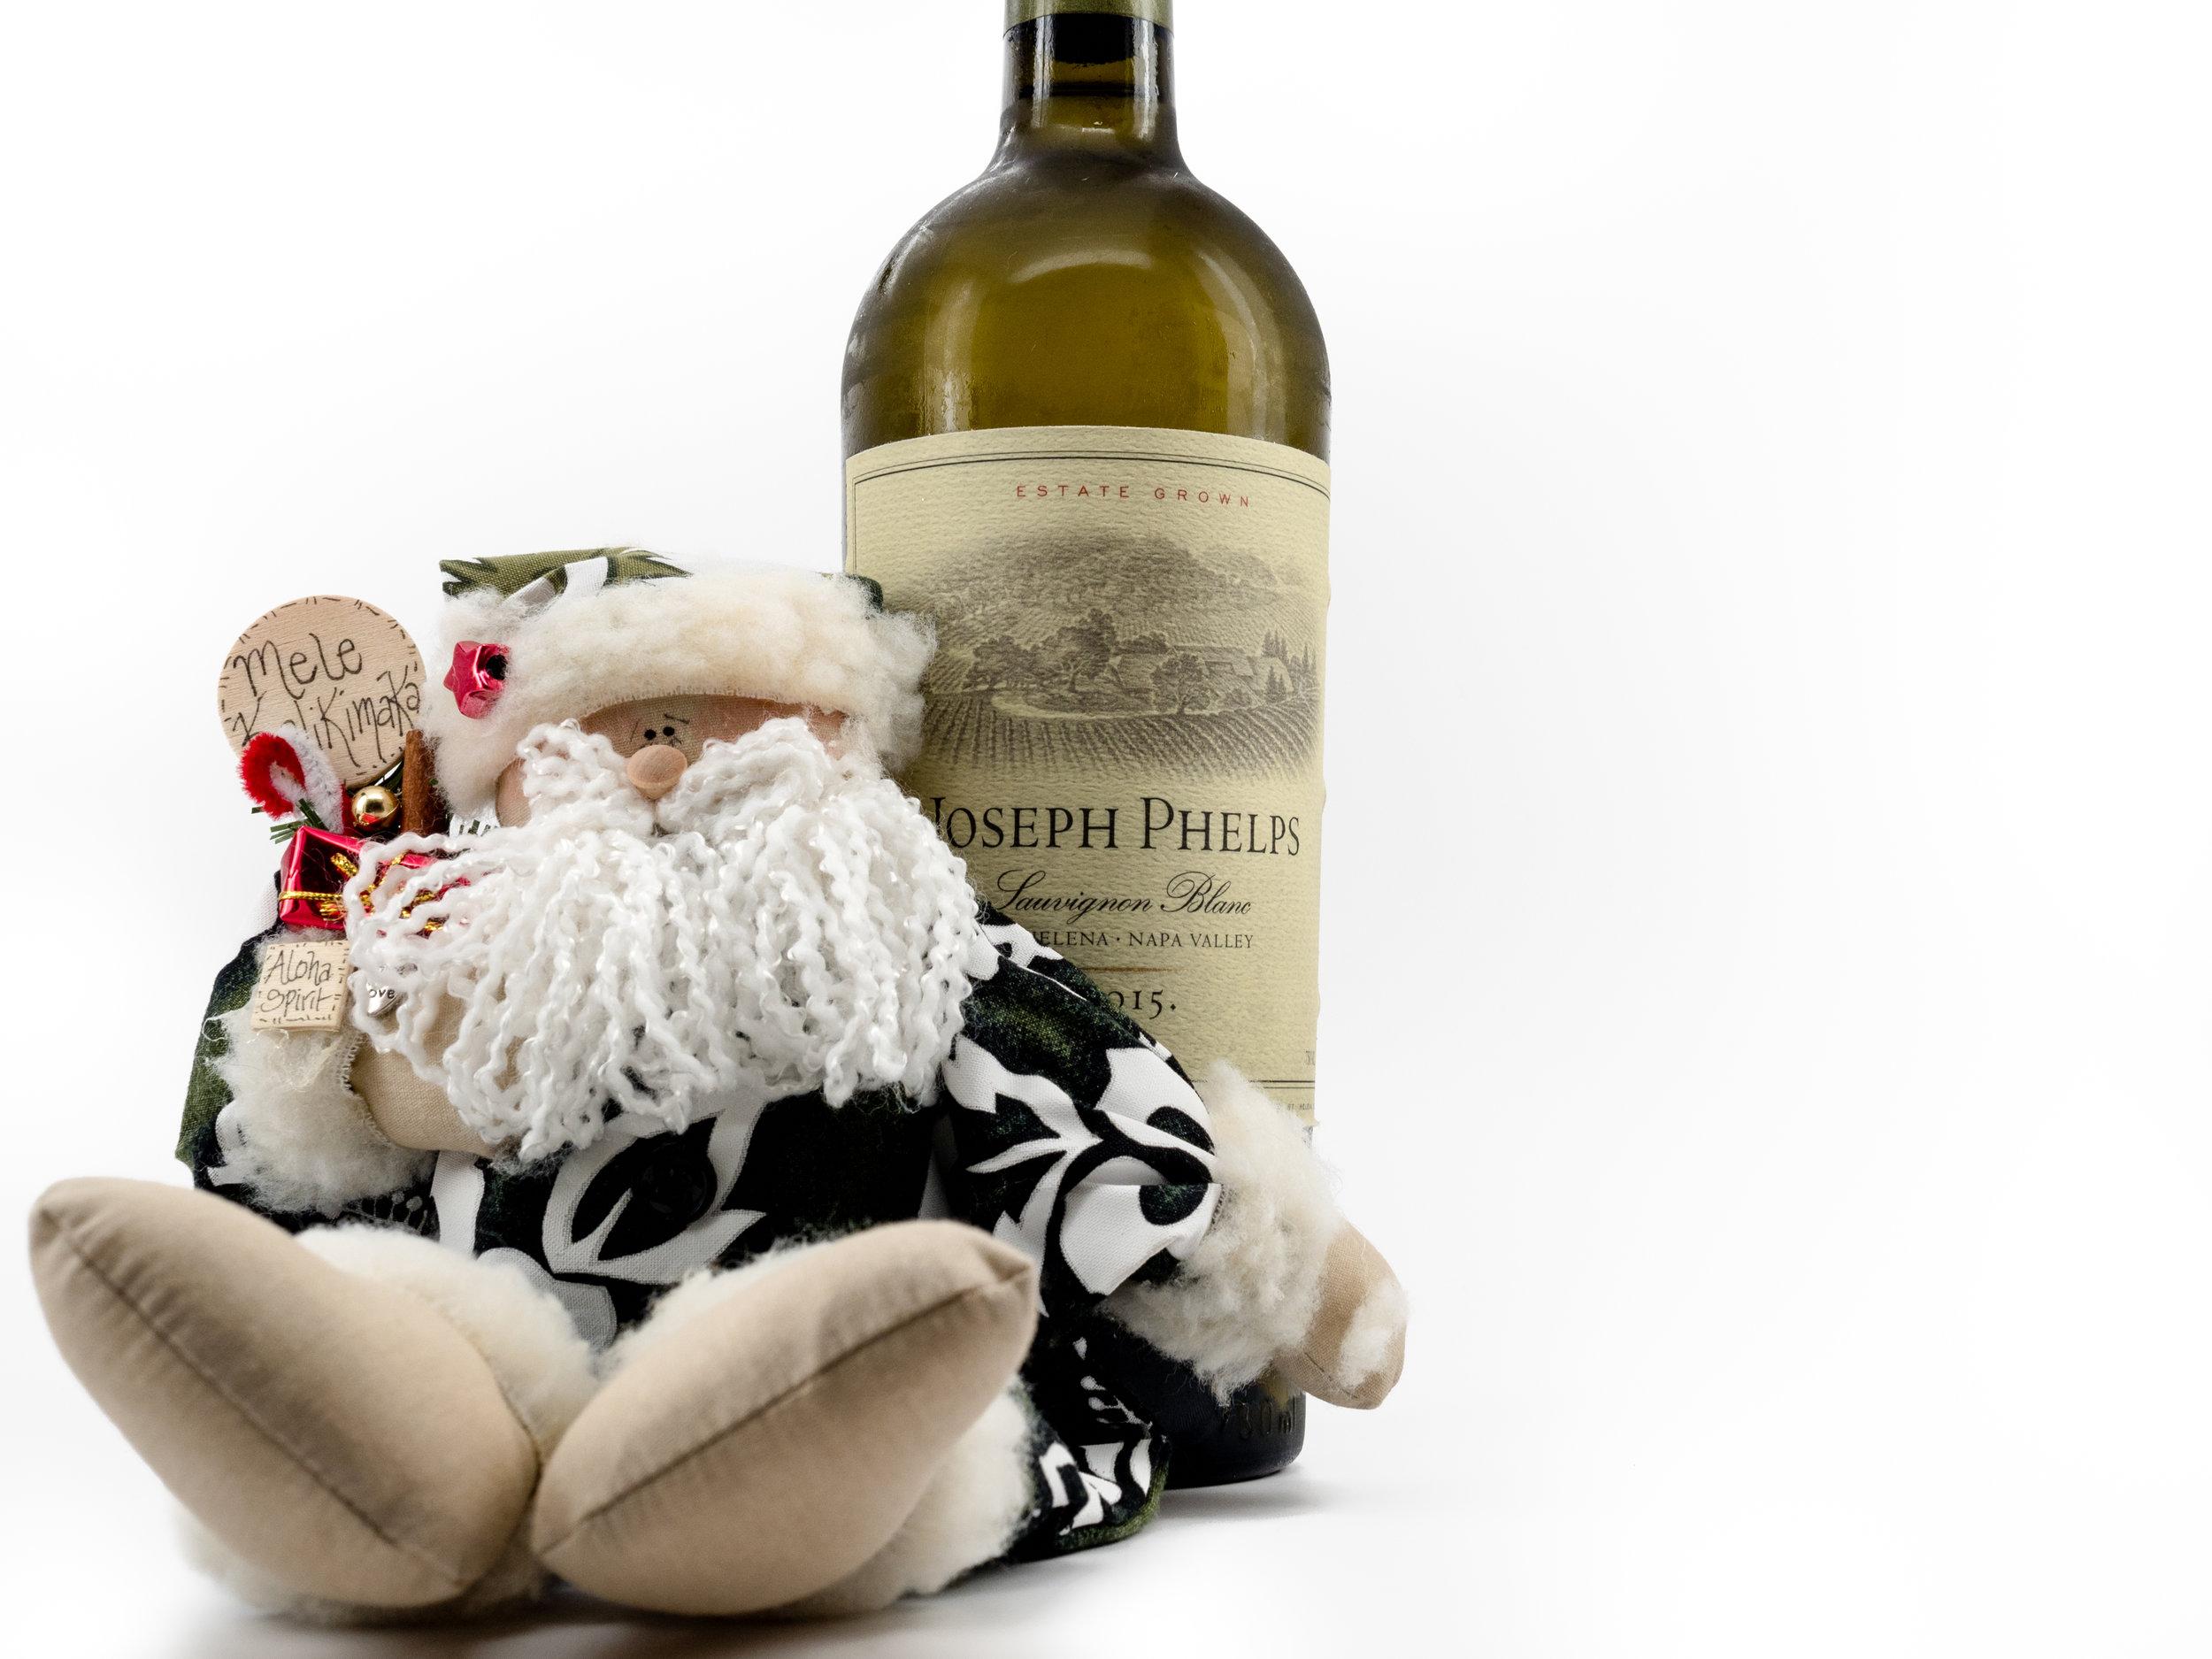 Musings by the Glass - Mele Kalikimaka - Hawaiian Christmas Music and Wine Pairings - Santa Loves 2015 Joseph Phelps Sauvignon Blanc from Napa Valley California